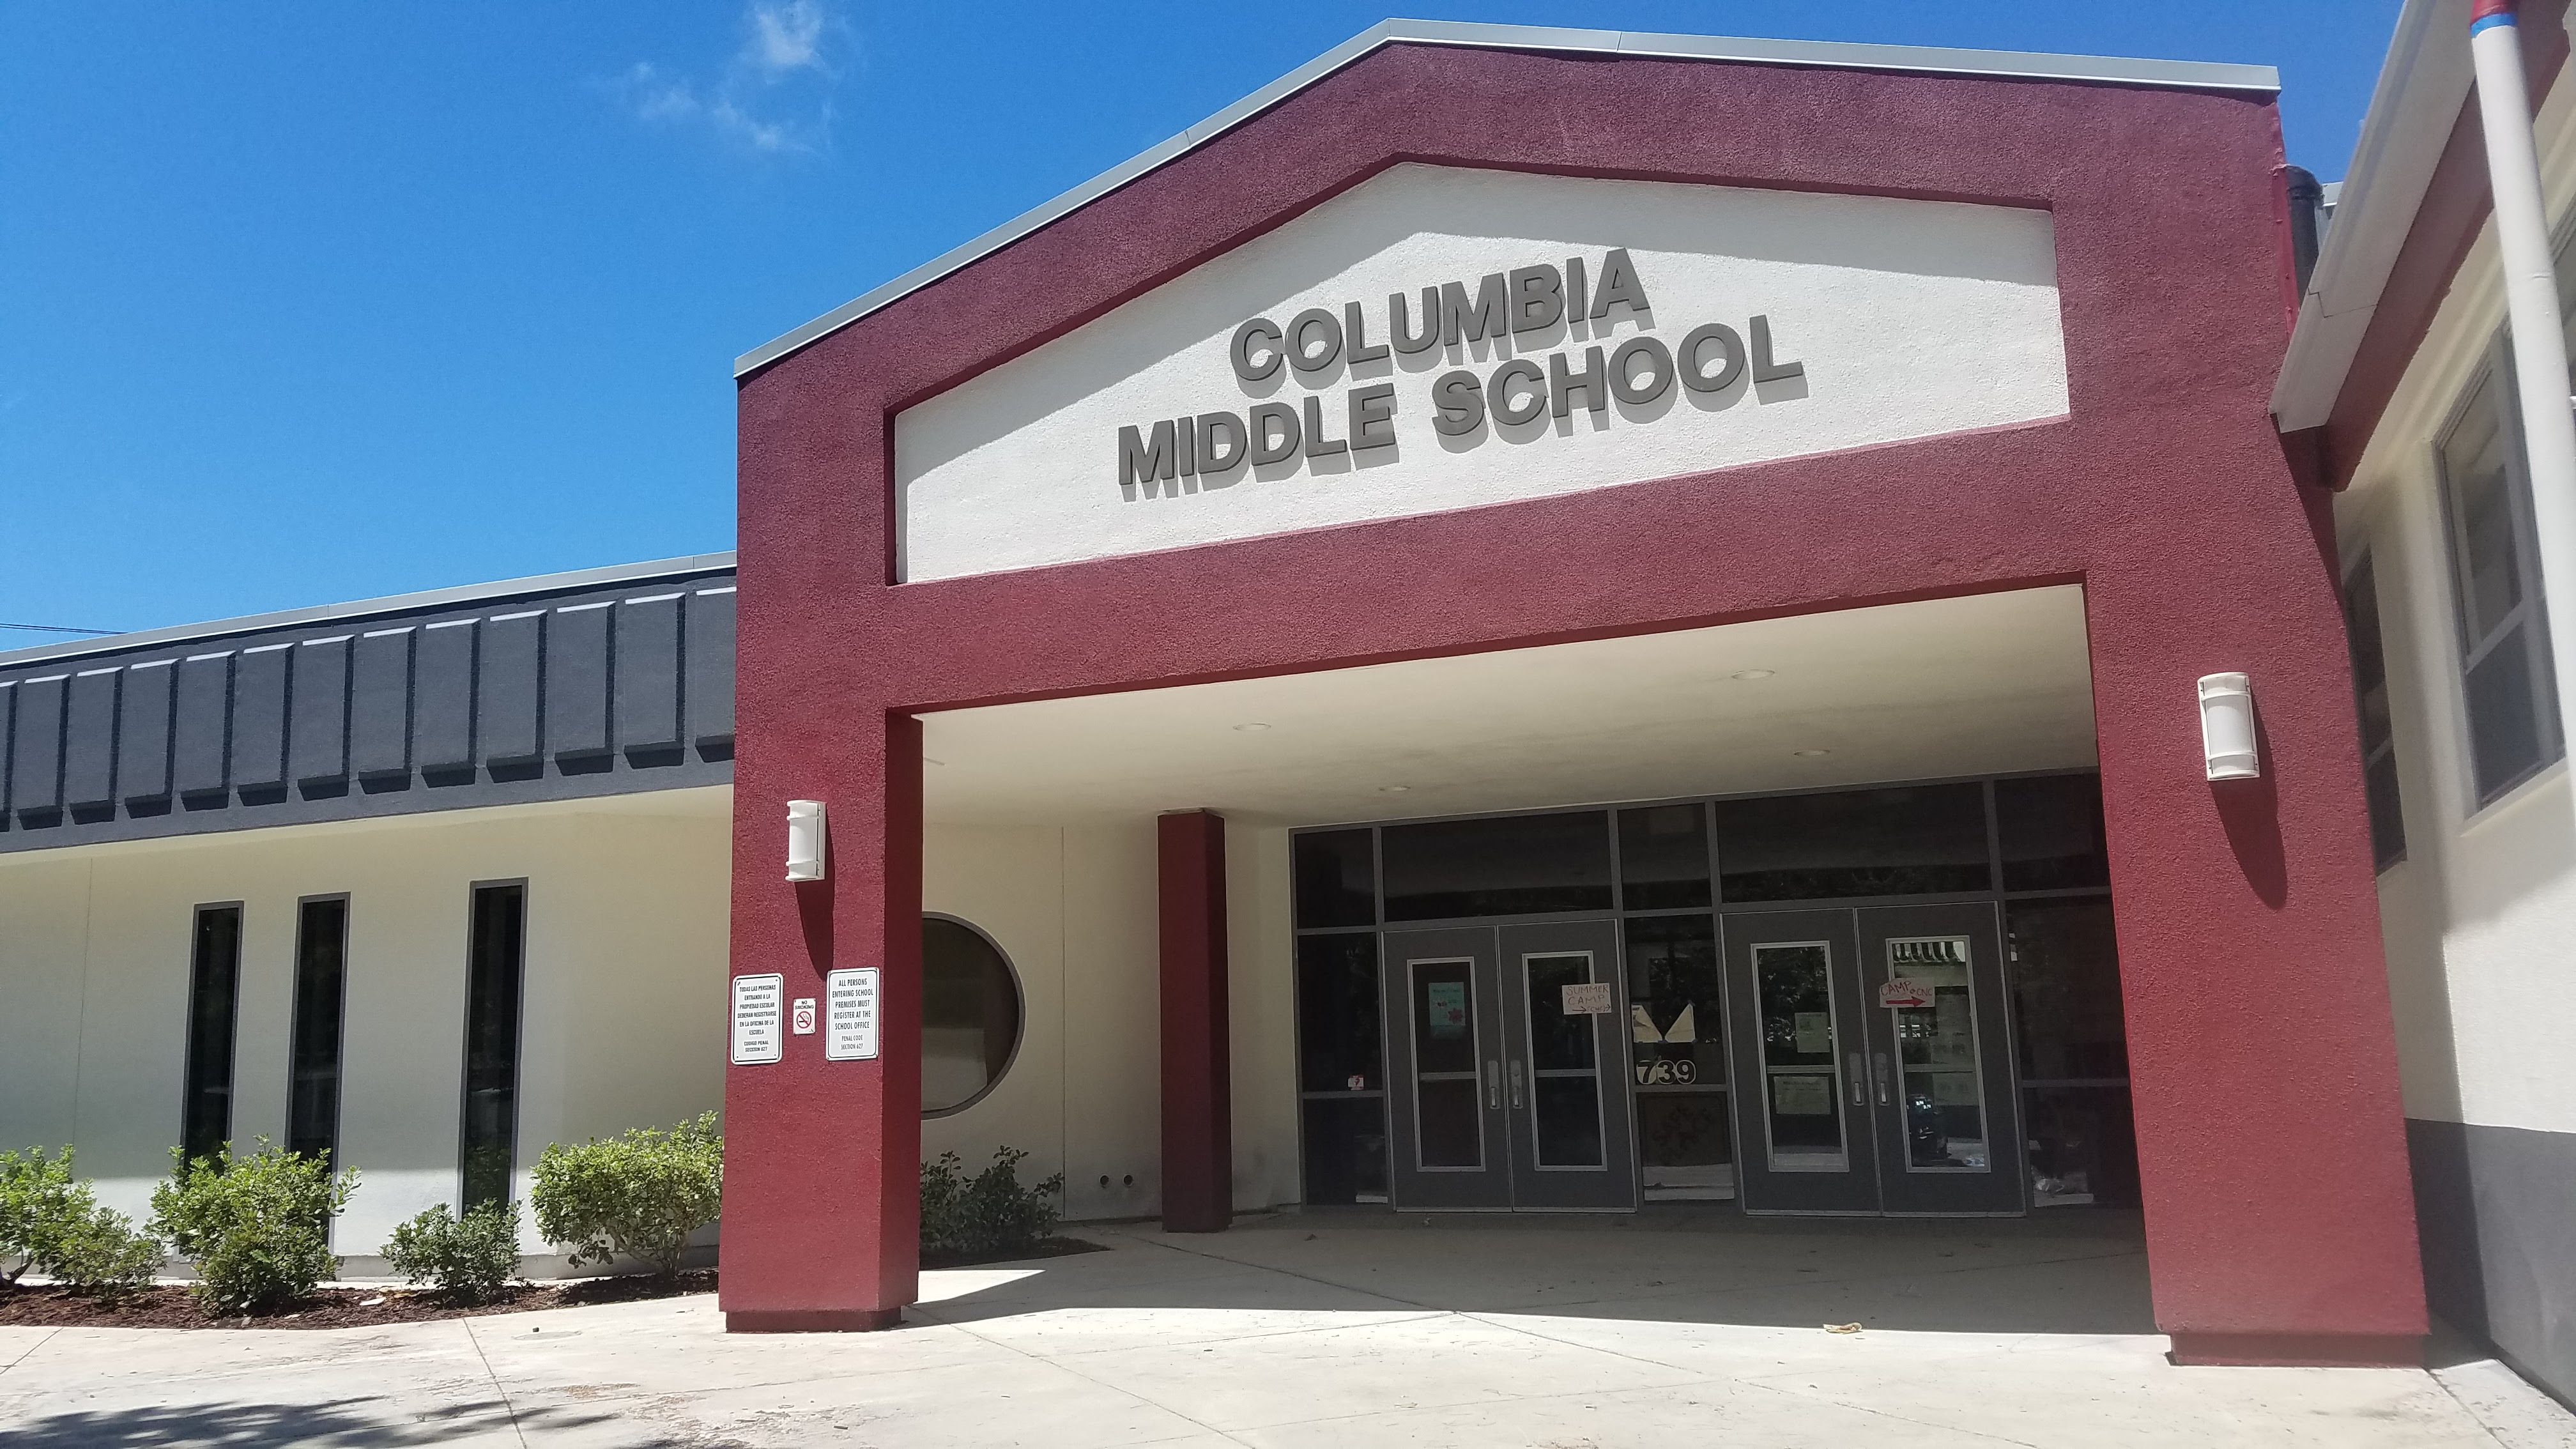 Columbia Middle School